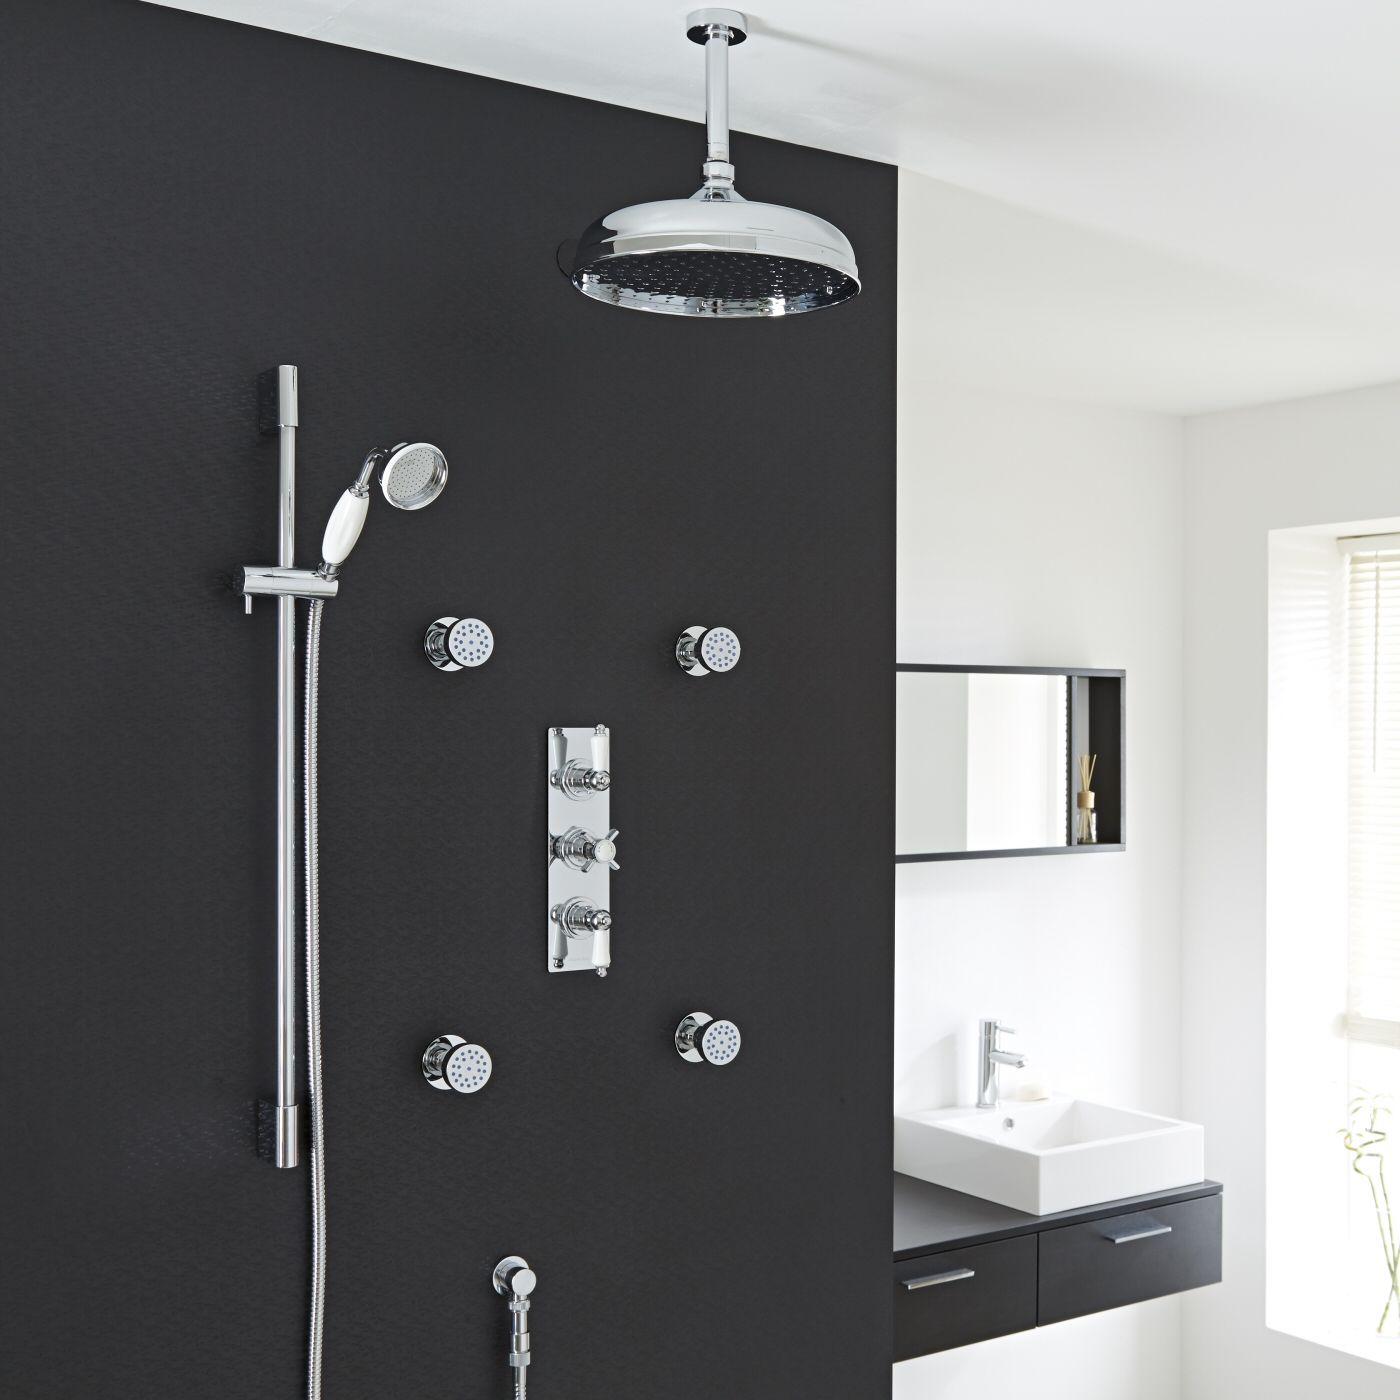 "Valquest Thermostatic Shower System with 12"" Ceiling Head, Handshower & 4 Round Jet Sprays"